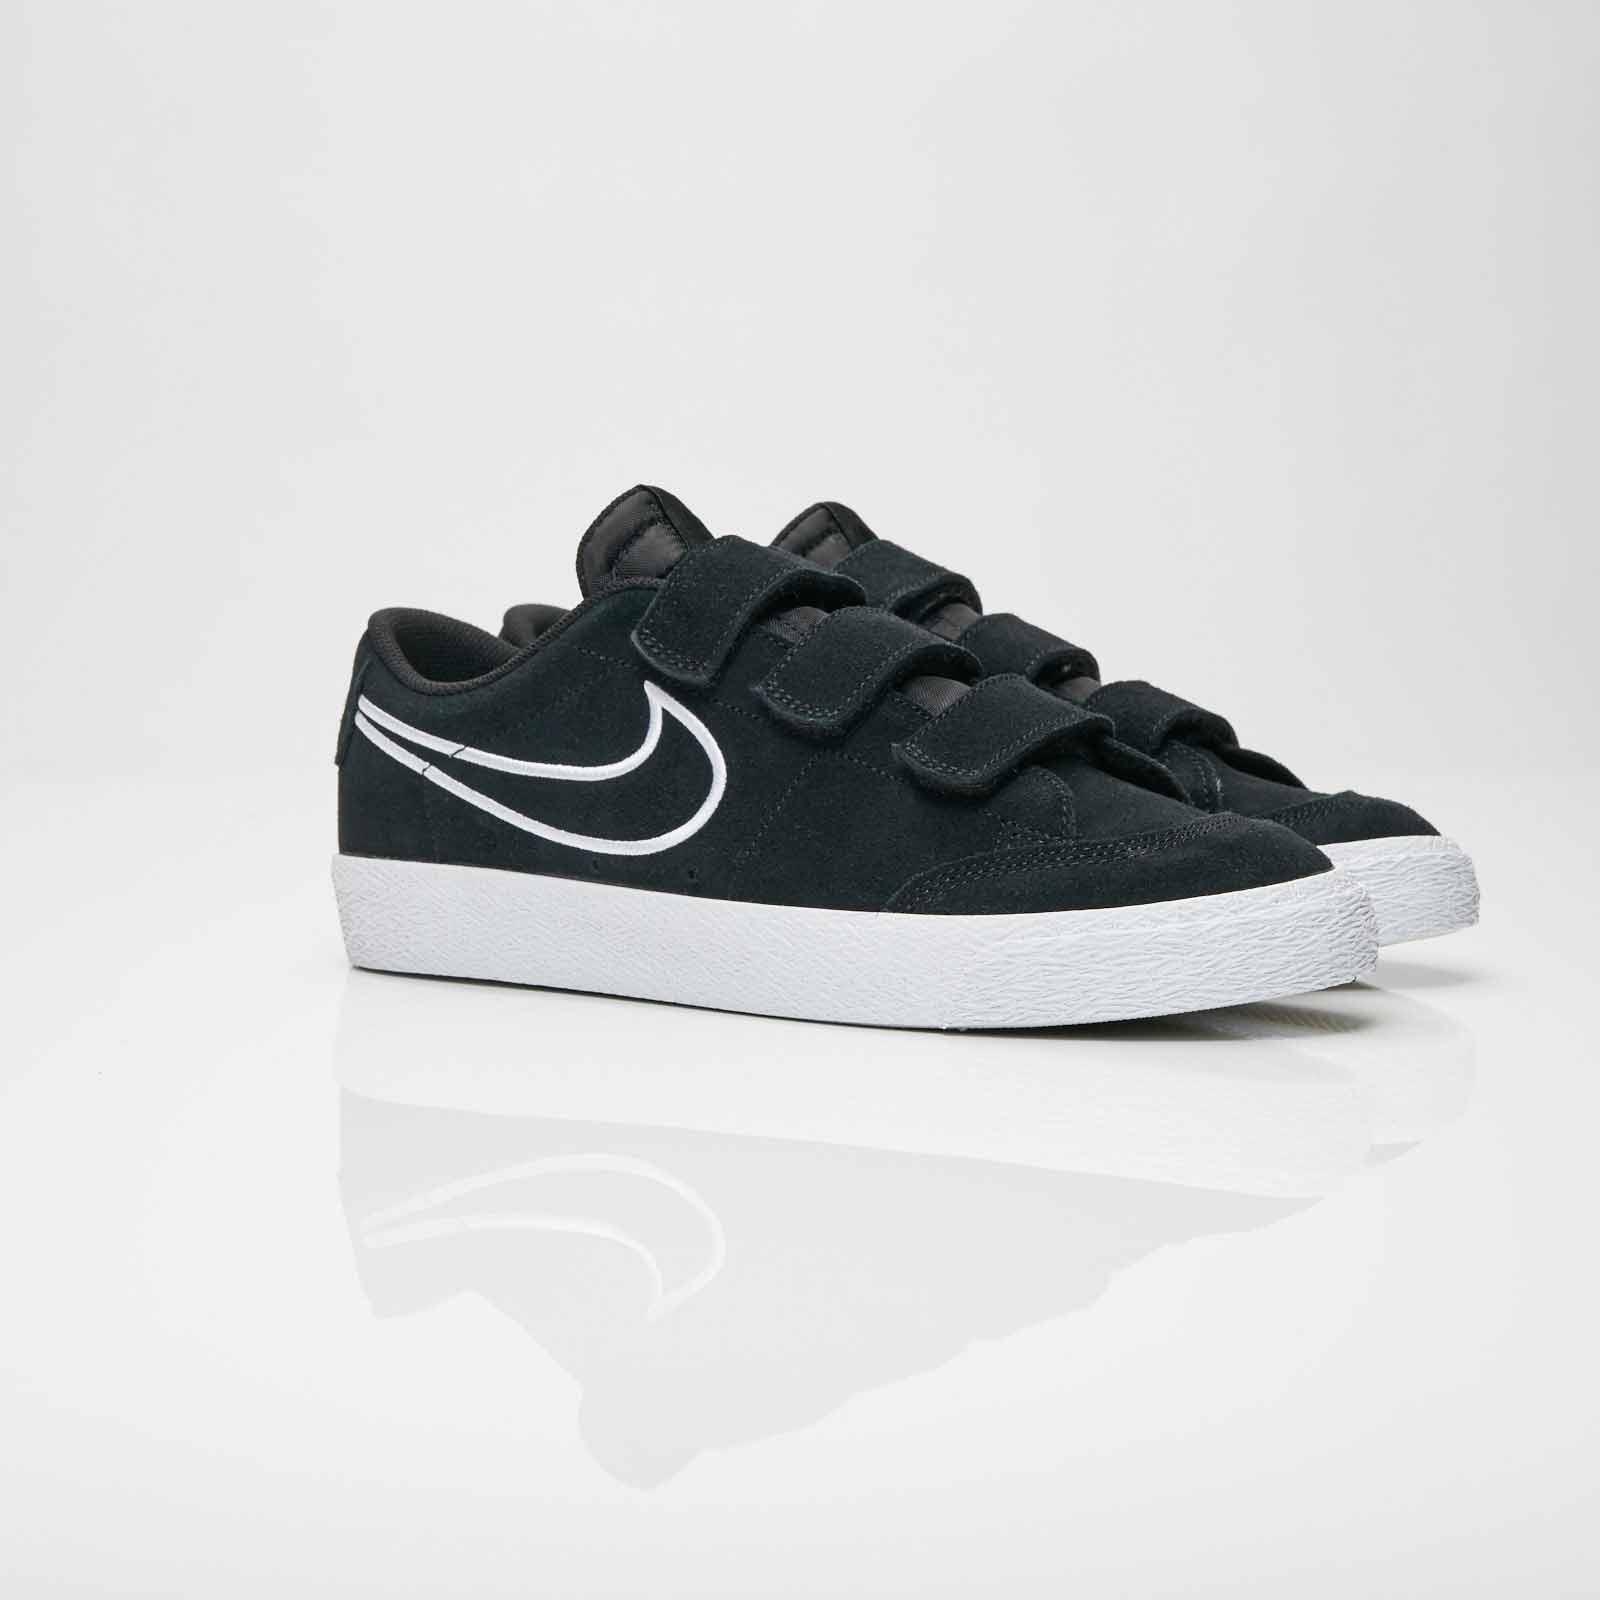 free shipping 0e7a2 50e76 Nike Zoom Blazer AC XT - Ah3434-001 - Sneakersnstuff | sneakers ...